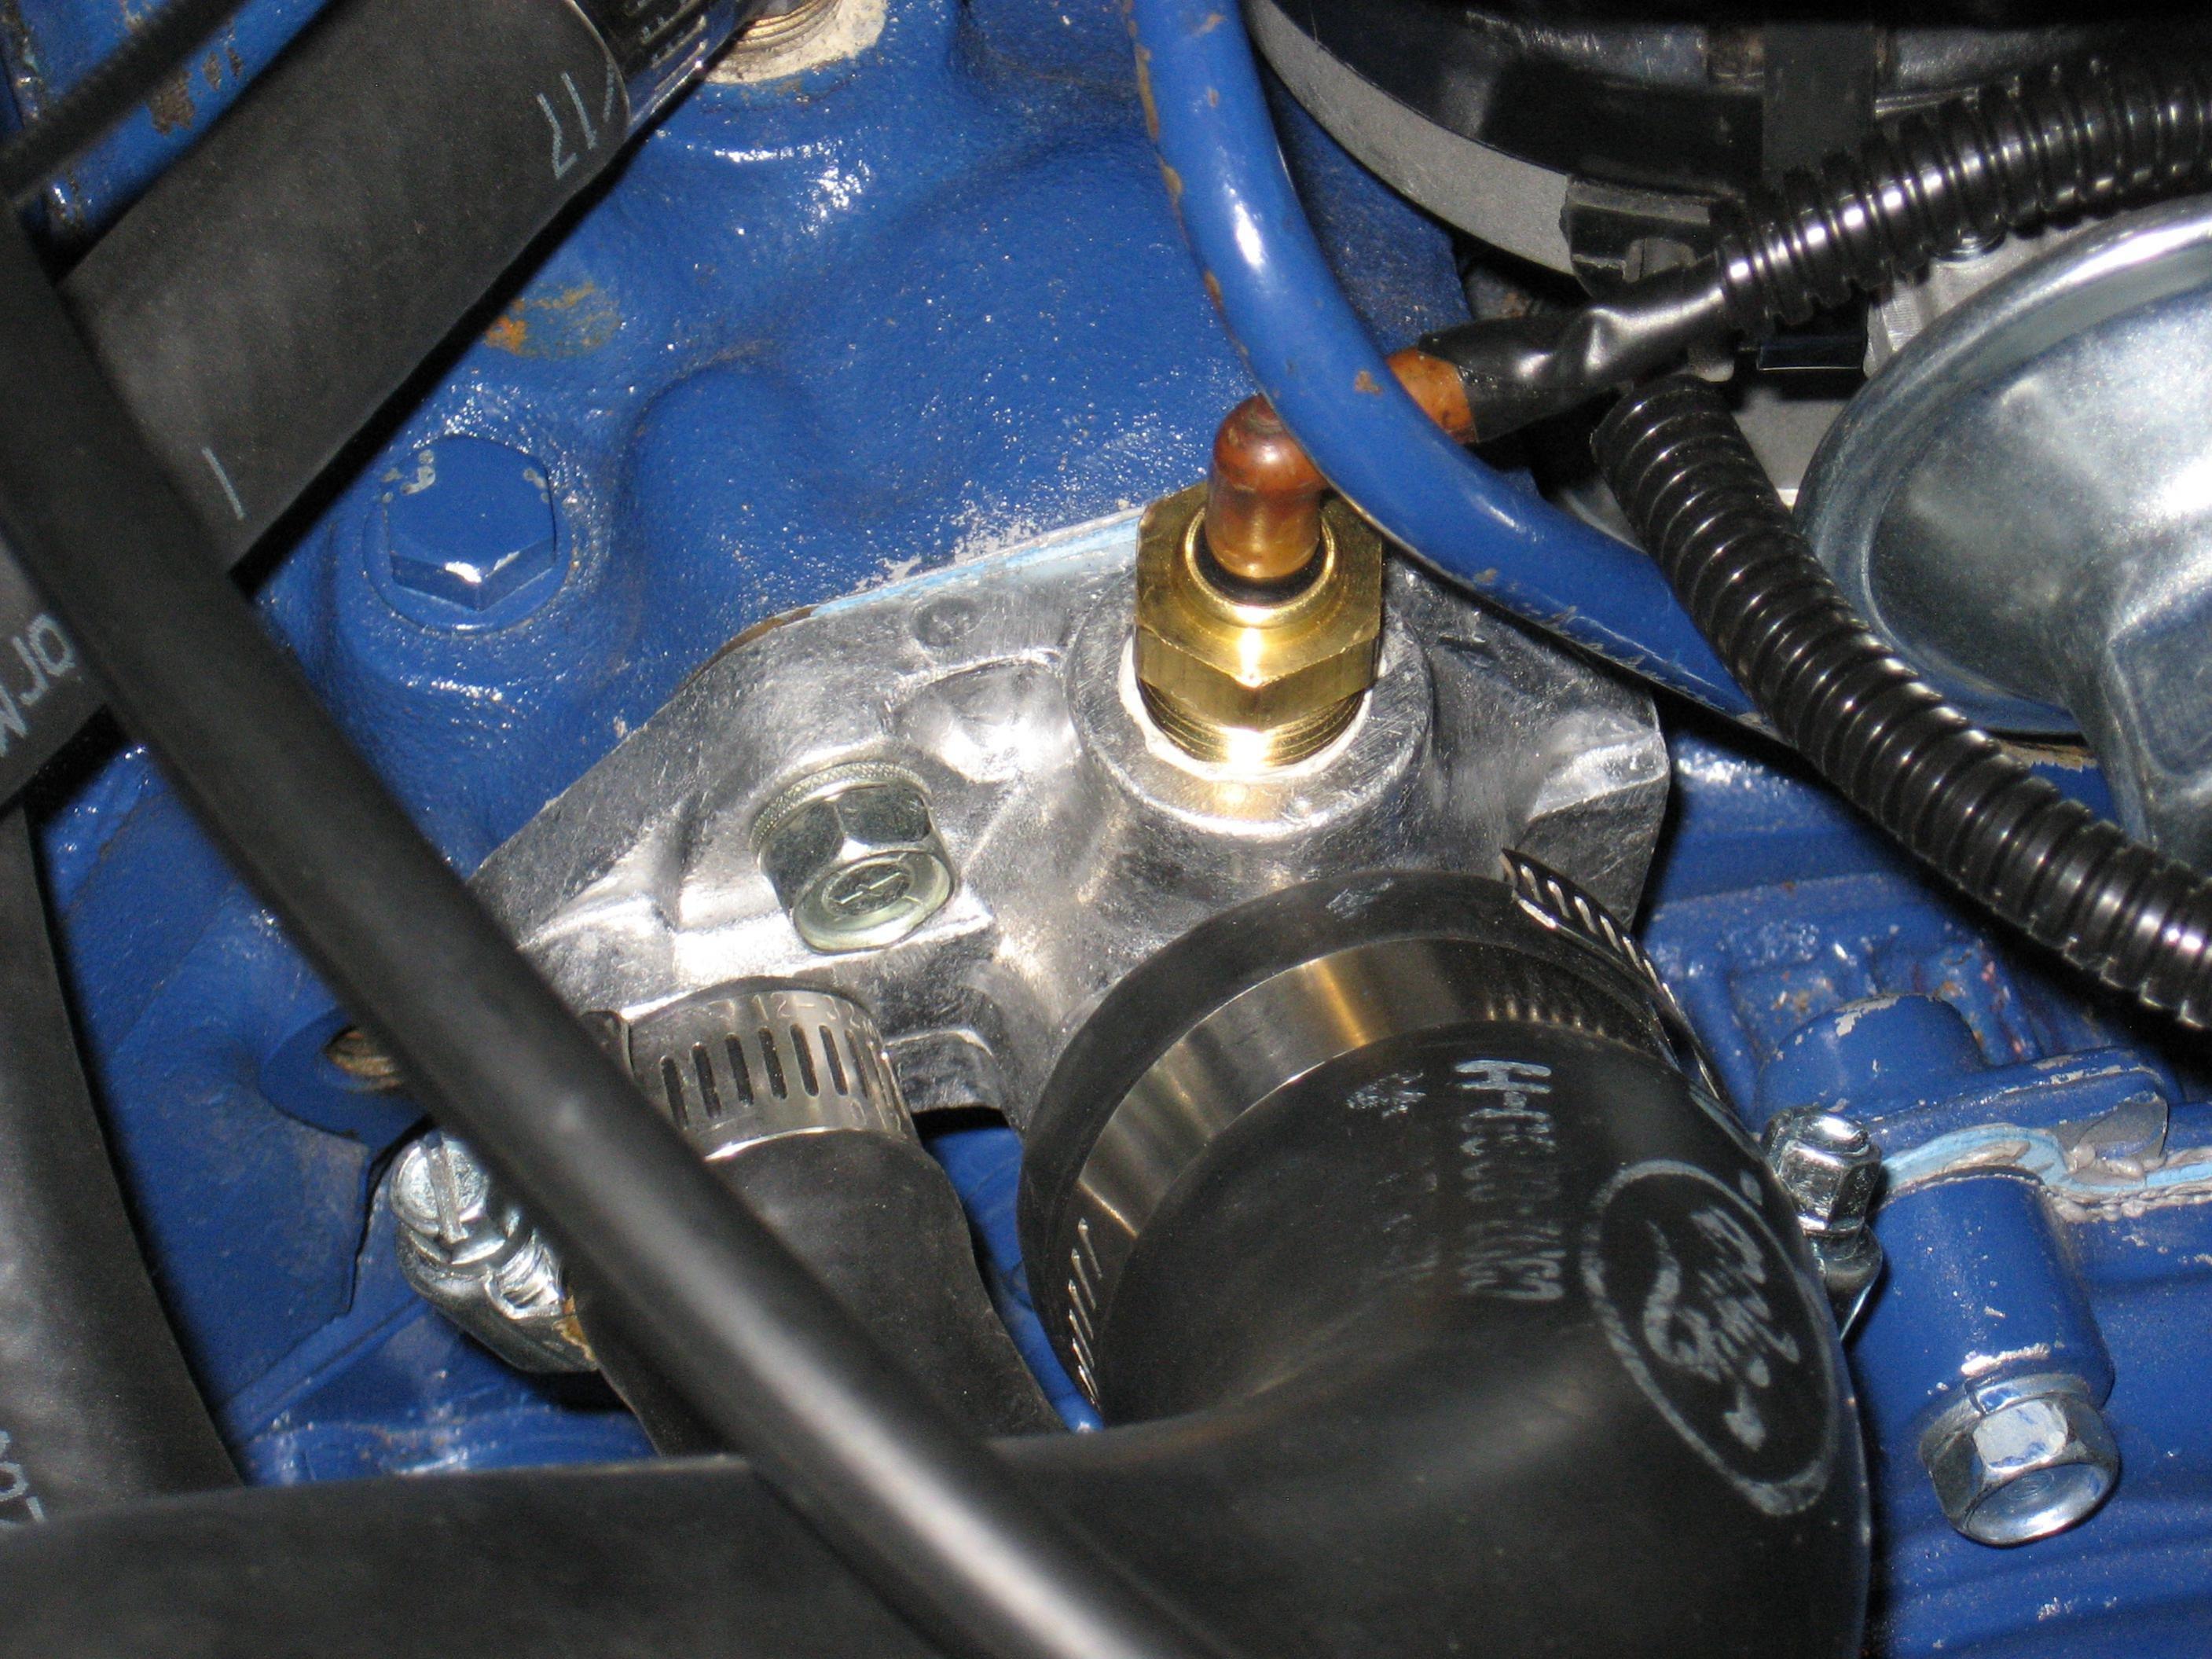 1965 Mustang Fuel Sending Unit Wiring Diagram Auto Electrical 68 Camaro 1990 Temperature Location